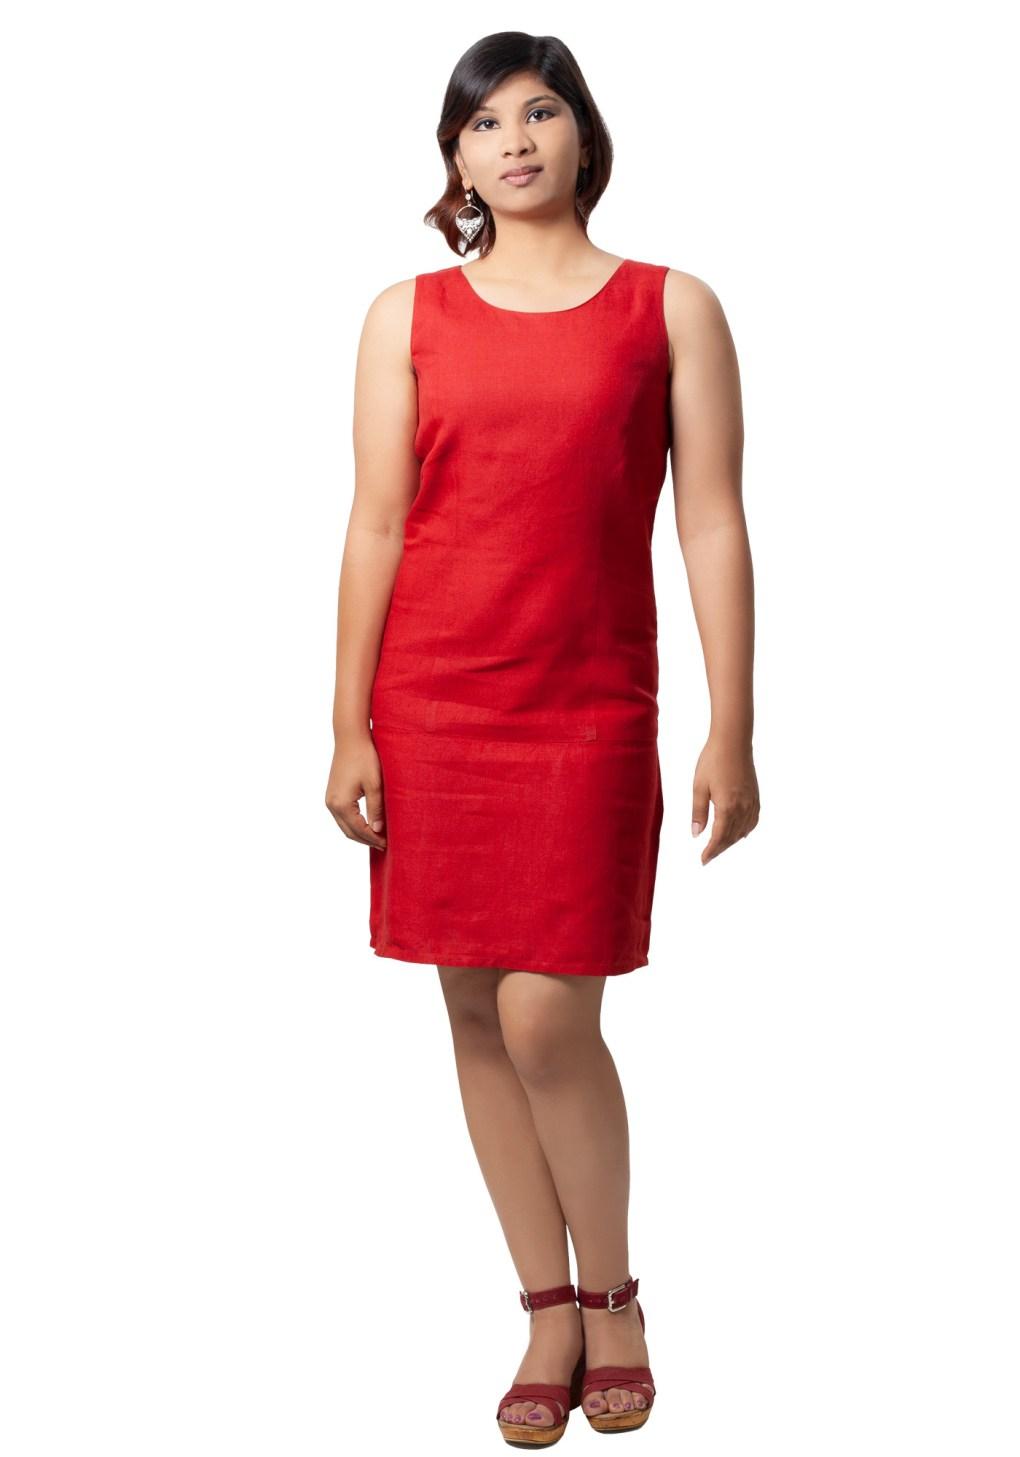 MINC ecofashion Stephanie Short Dress In Bright Red Linen